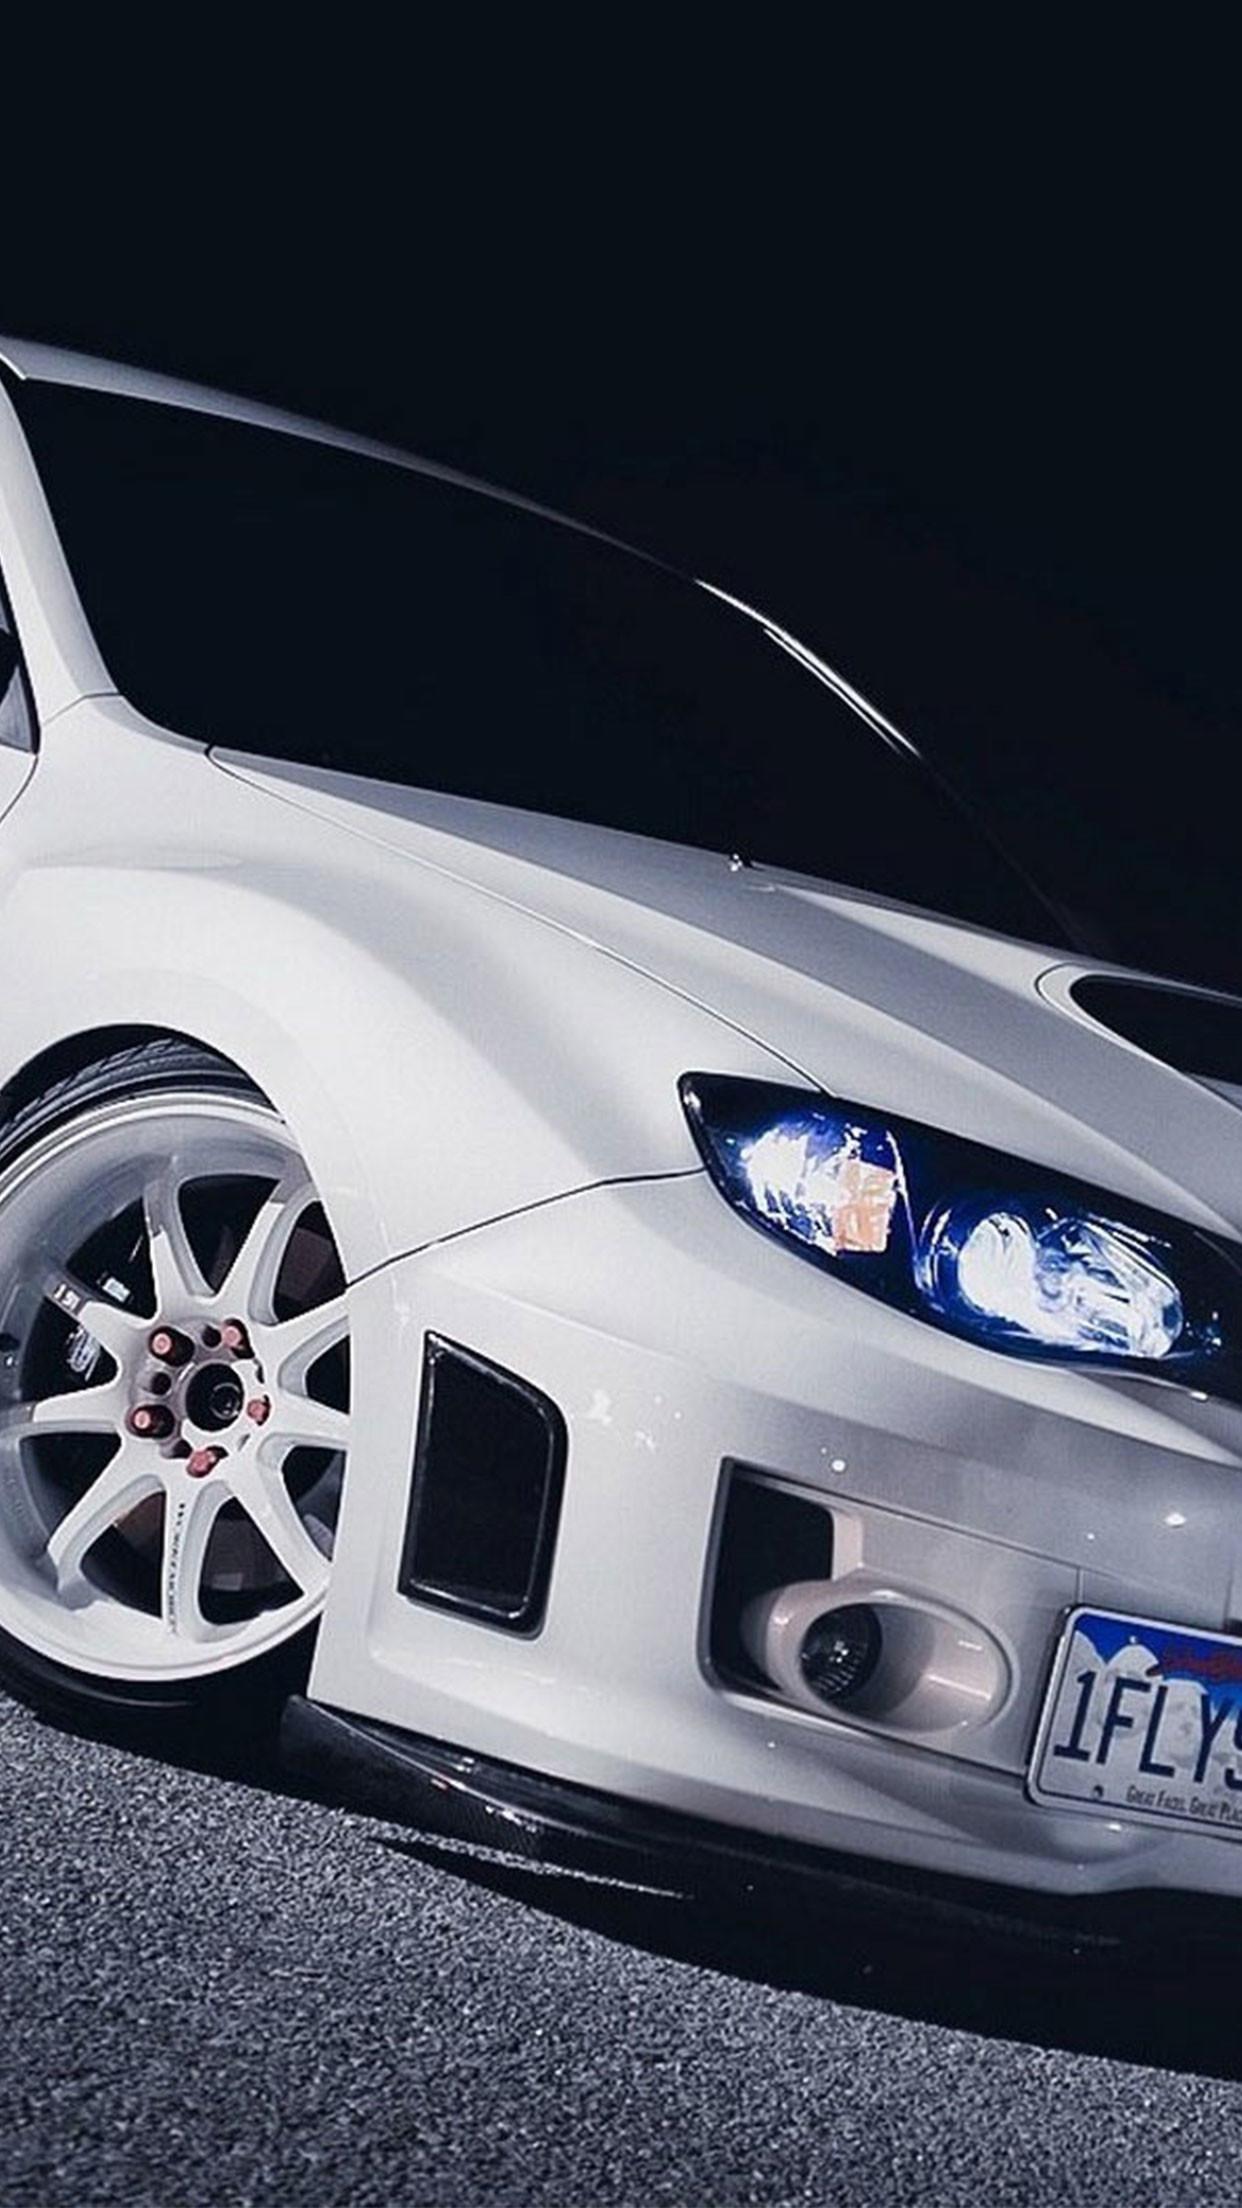 Subaru white car wallpaper for #Iphone #android #subaru #wallpaper more on  wallzapp